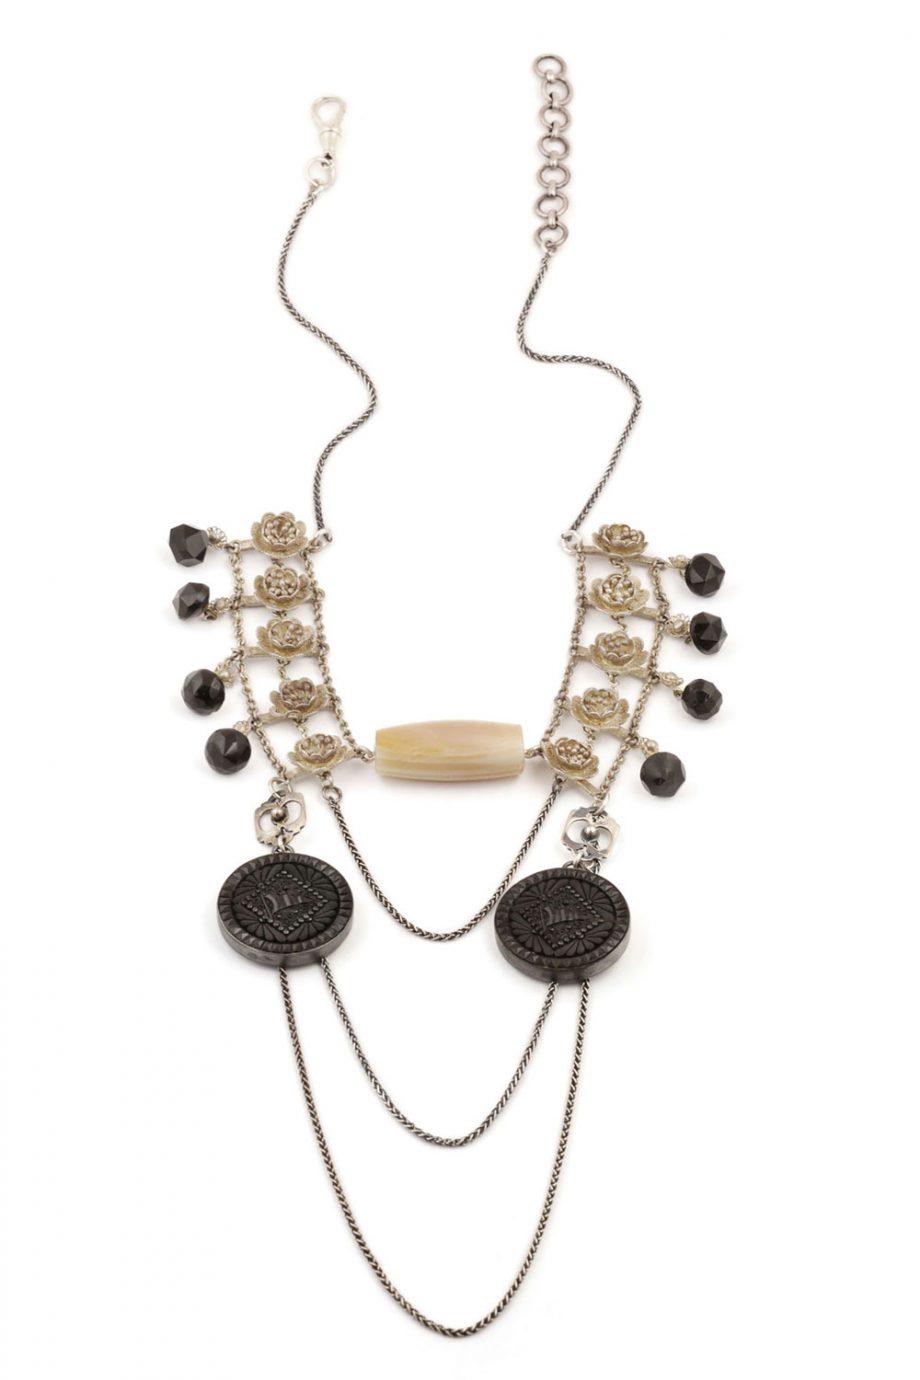 Intrigue necklace